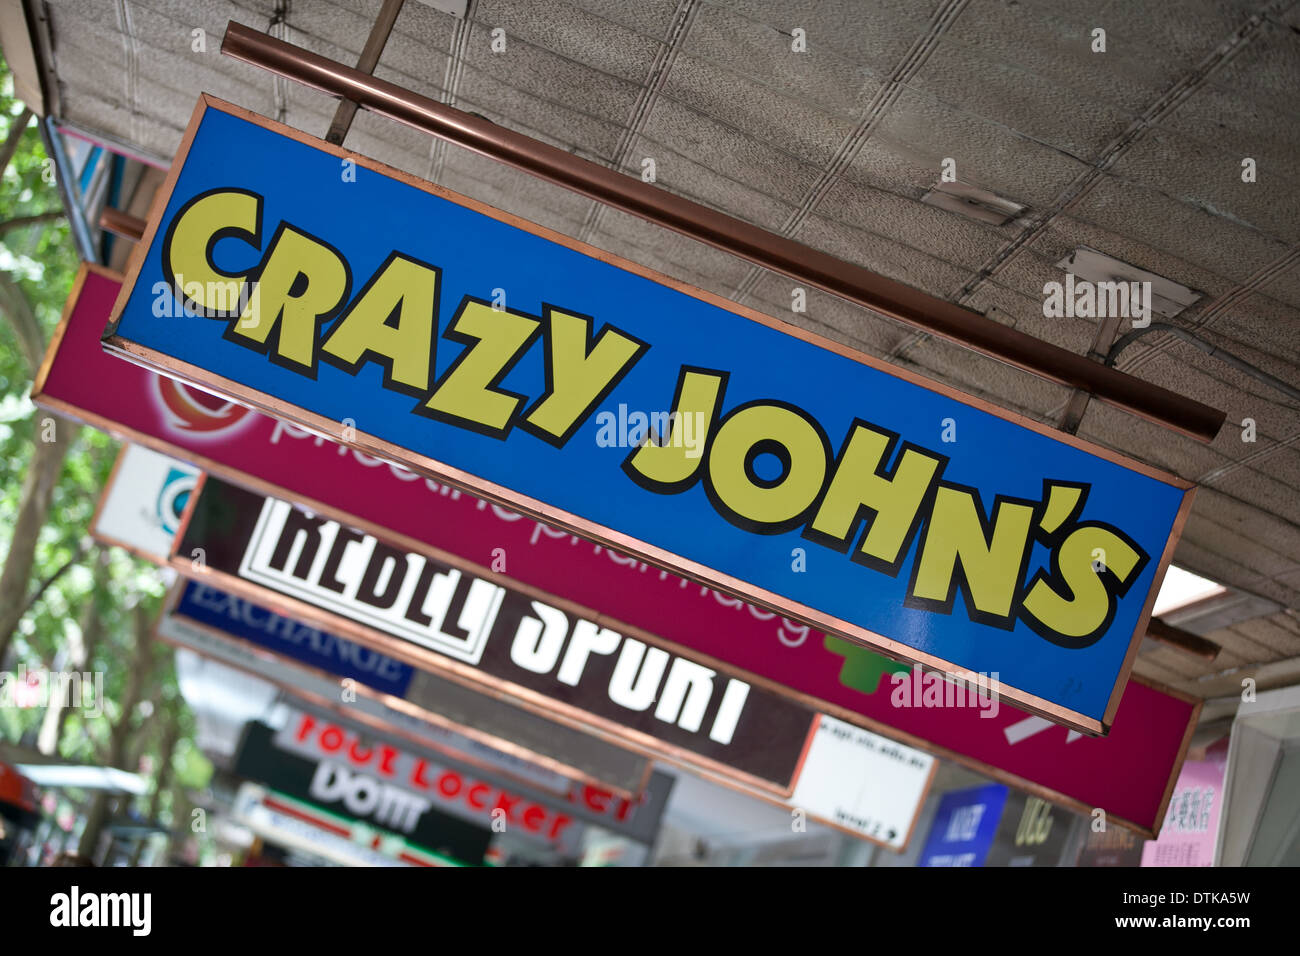 Crazy John's mobile phone store, Melbourne Photo Stock